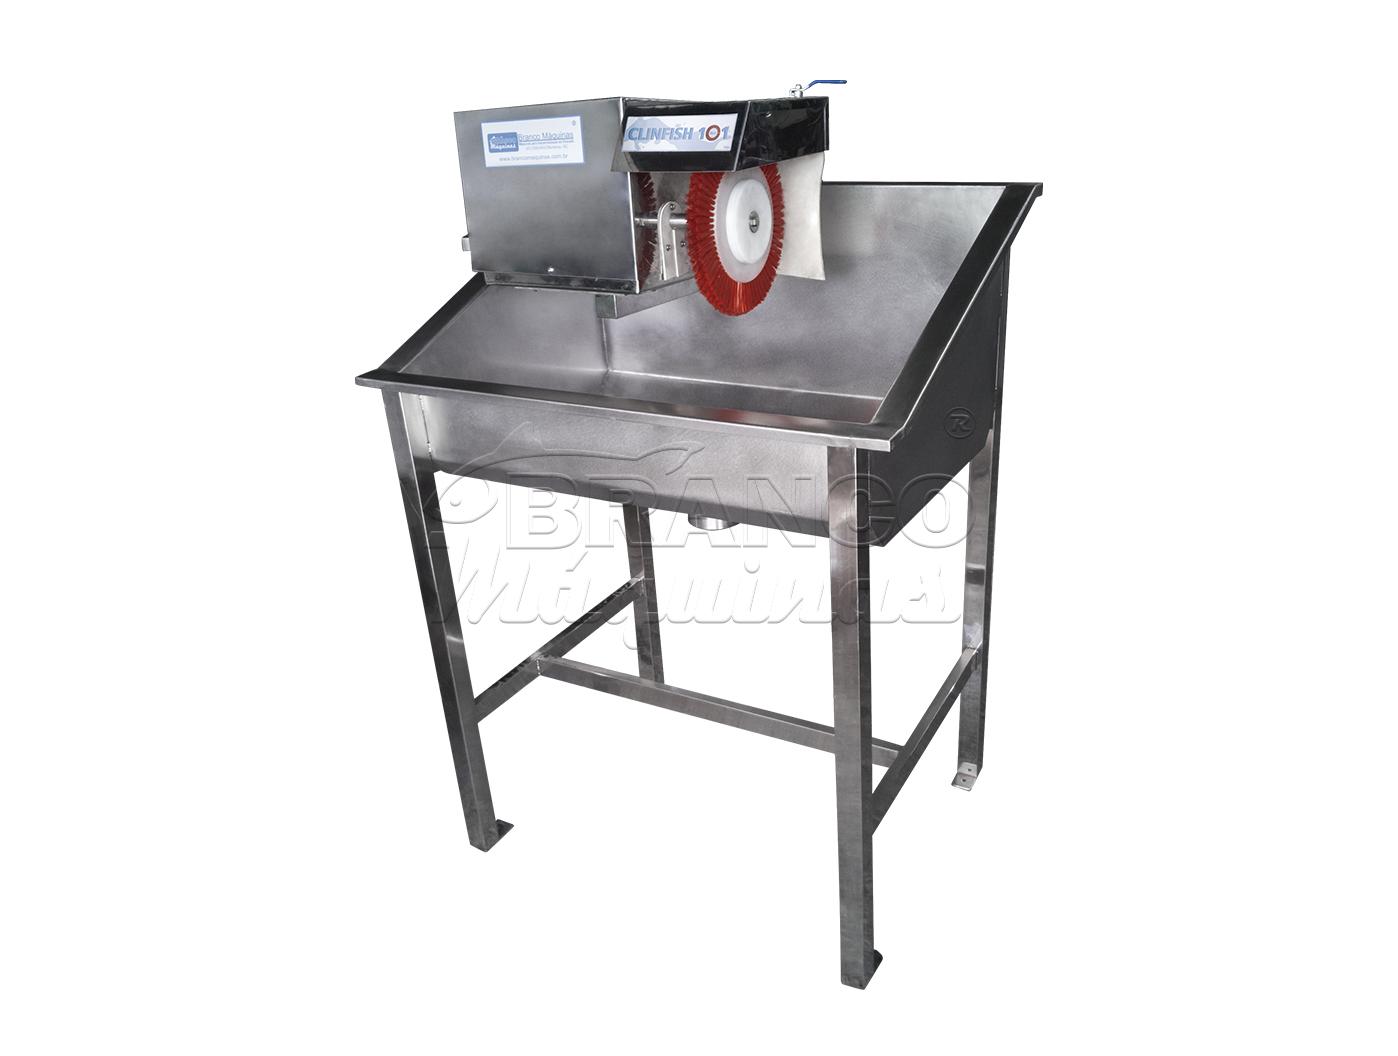 Cocho e Máquina de Escova Rotativa Clinfish 101